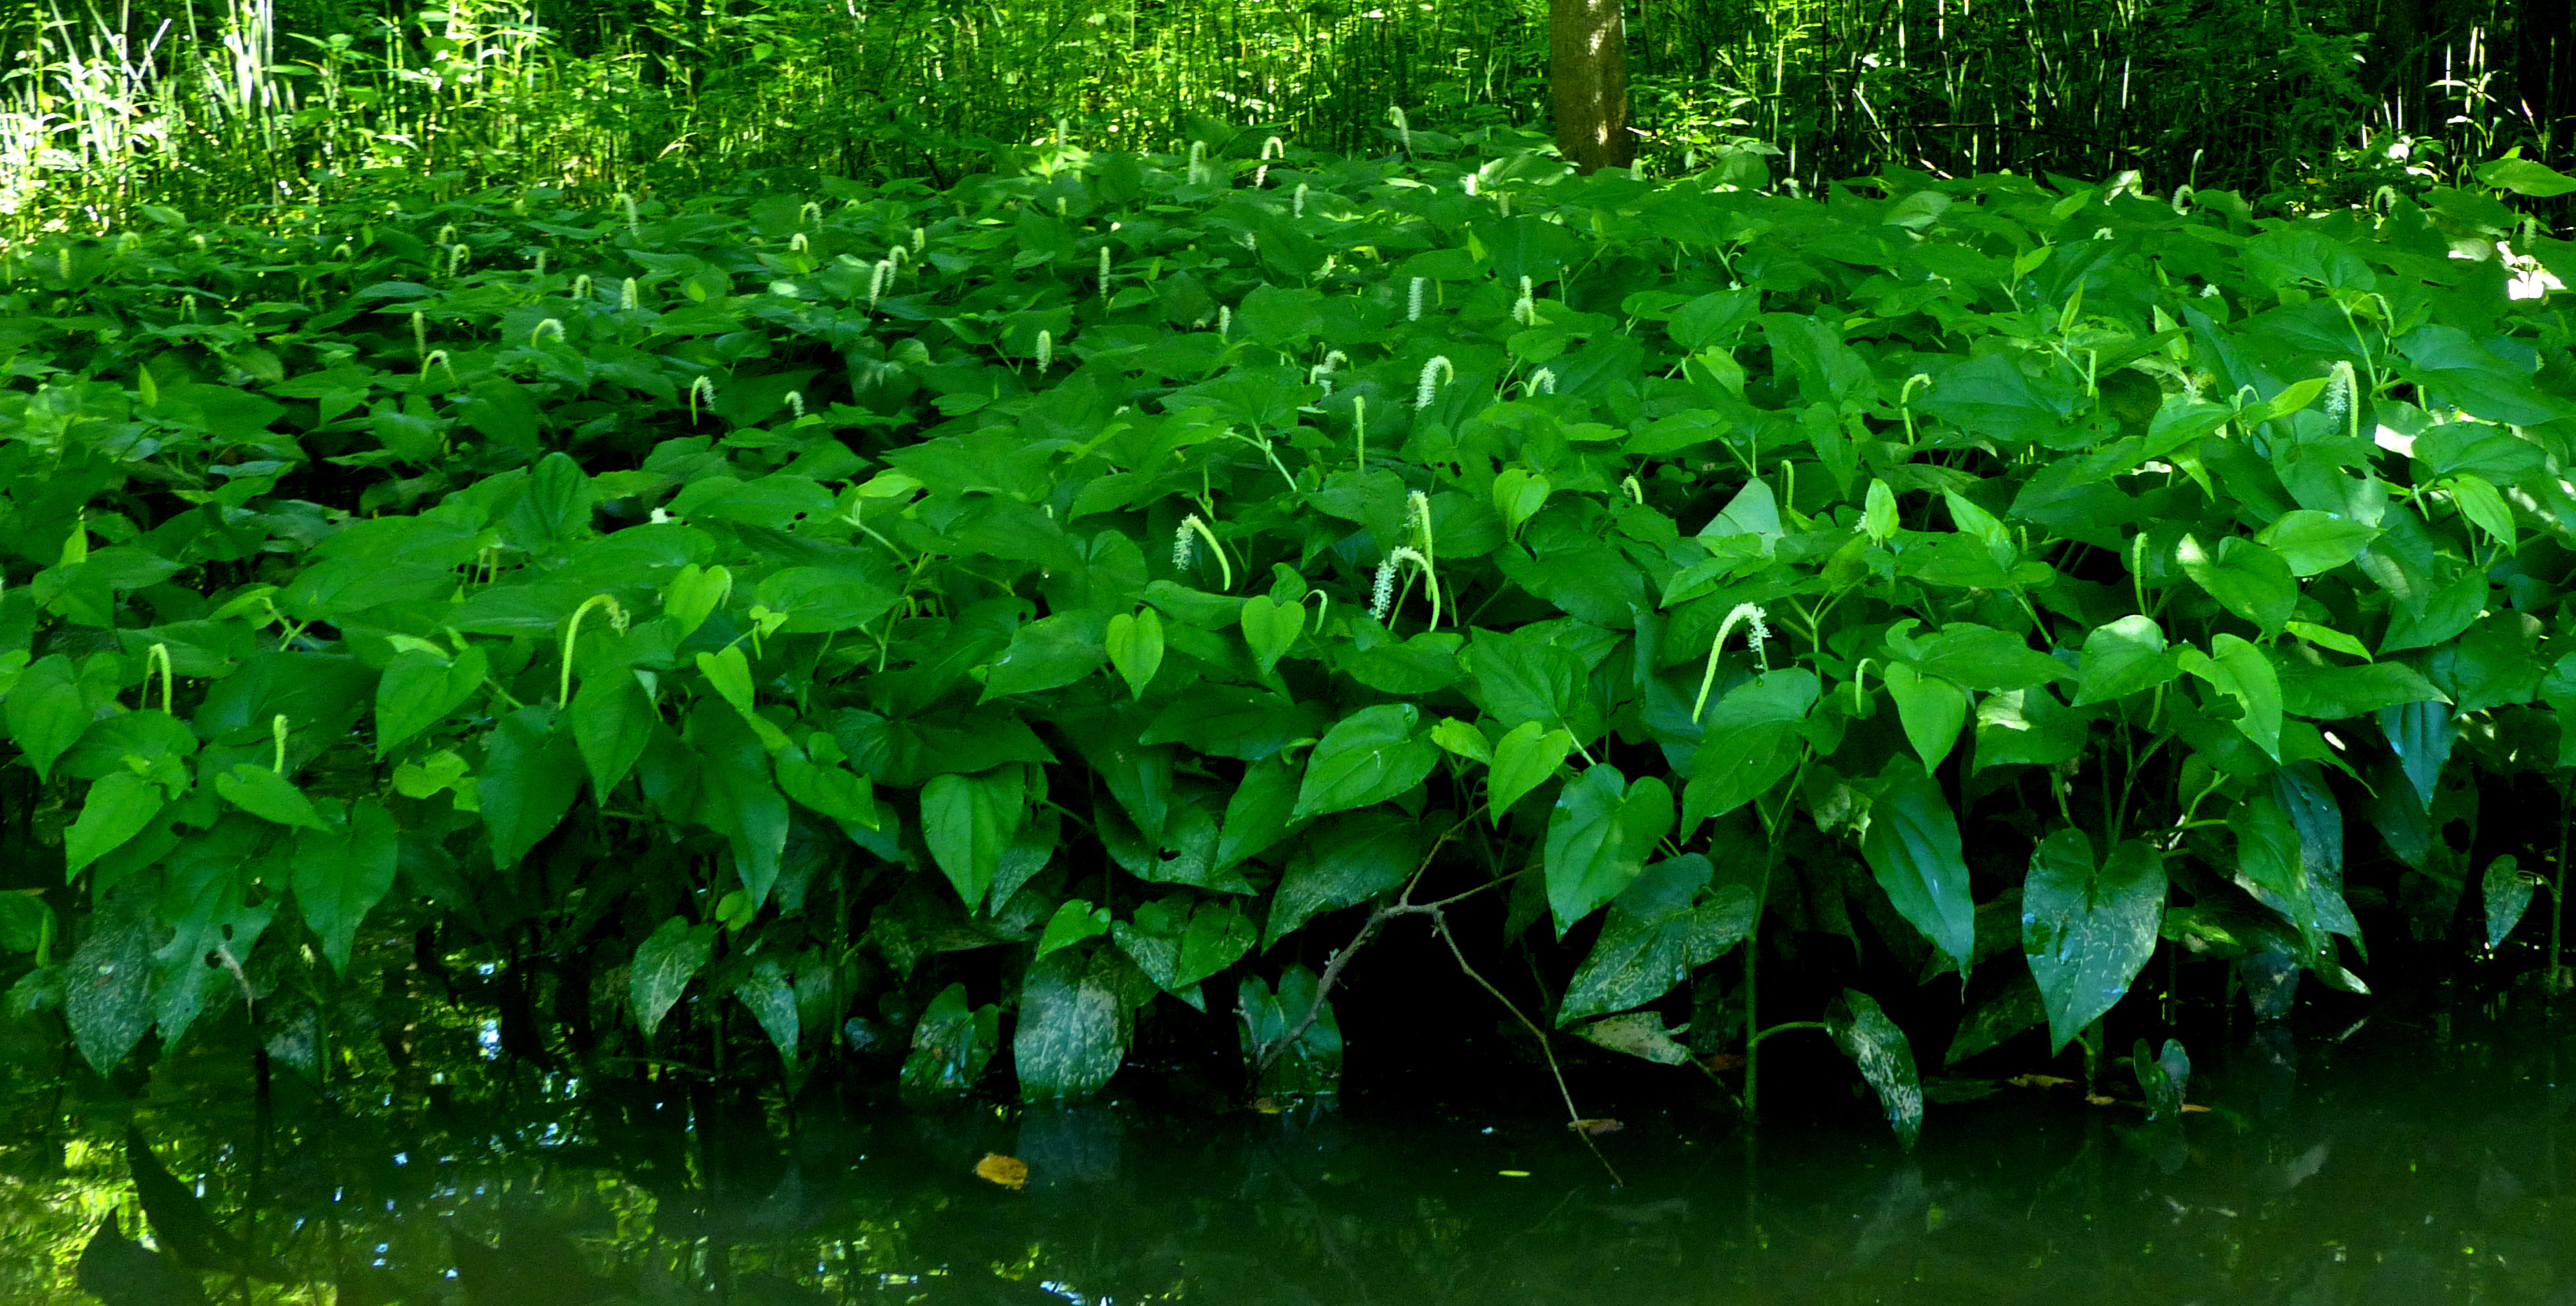 Lizard's Tail Landscape2 062918 Alum Creek paddle fz200 fix